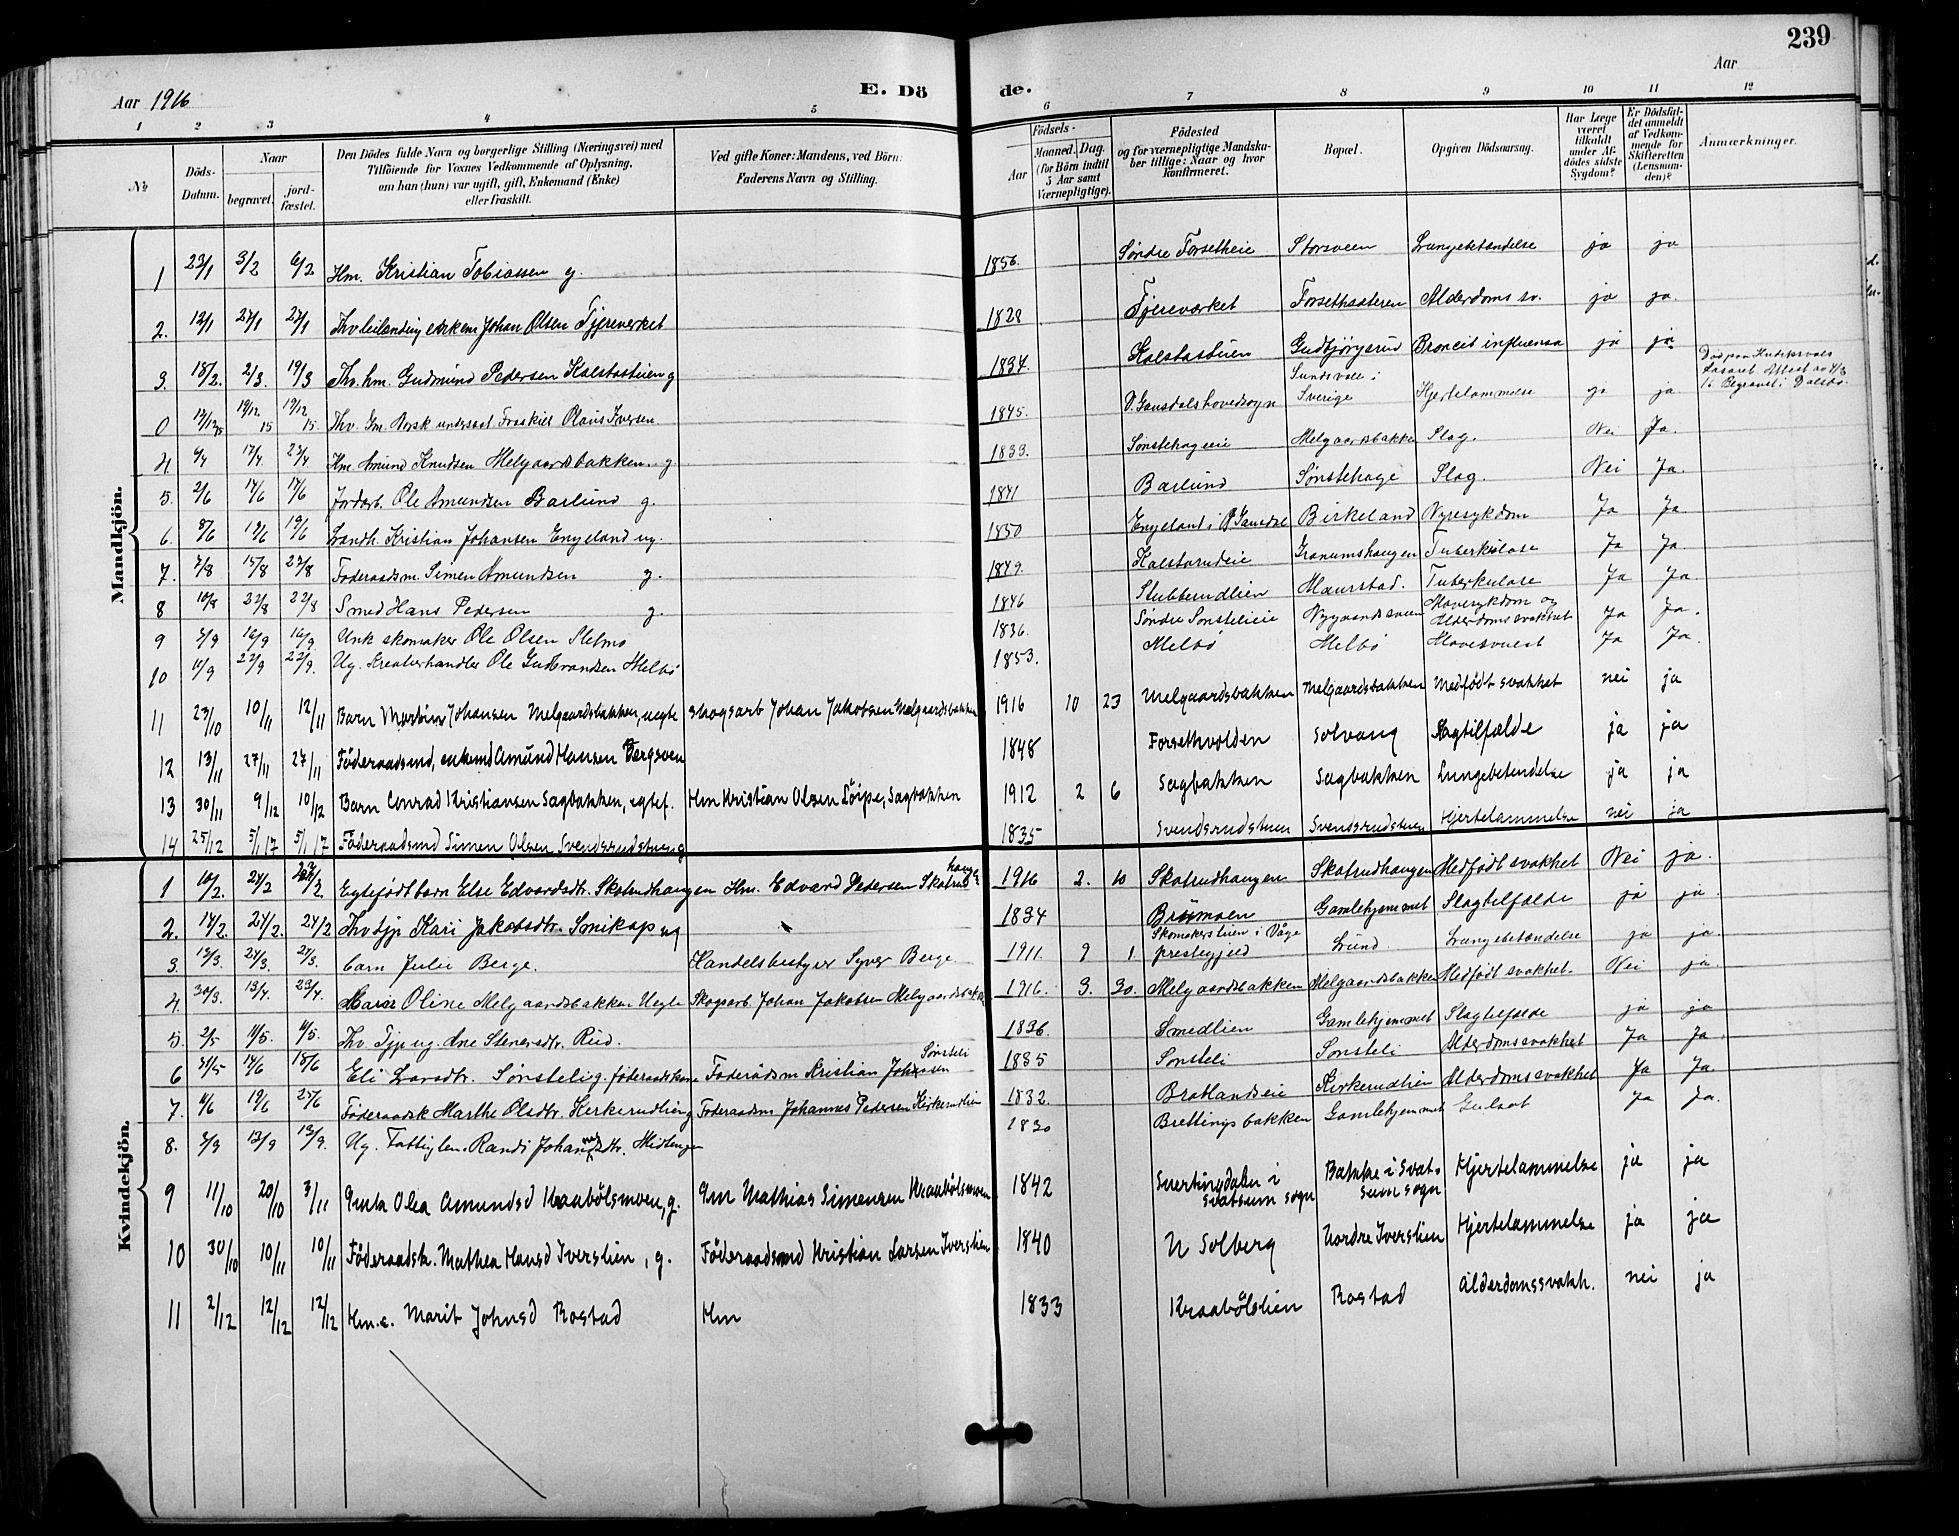 SAH, Vestre Gausdal prestekontor, Klokkerbok nr. 3, 1896-1925, s. 239